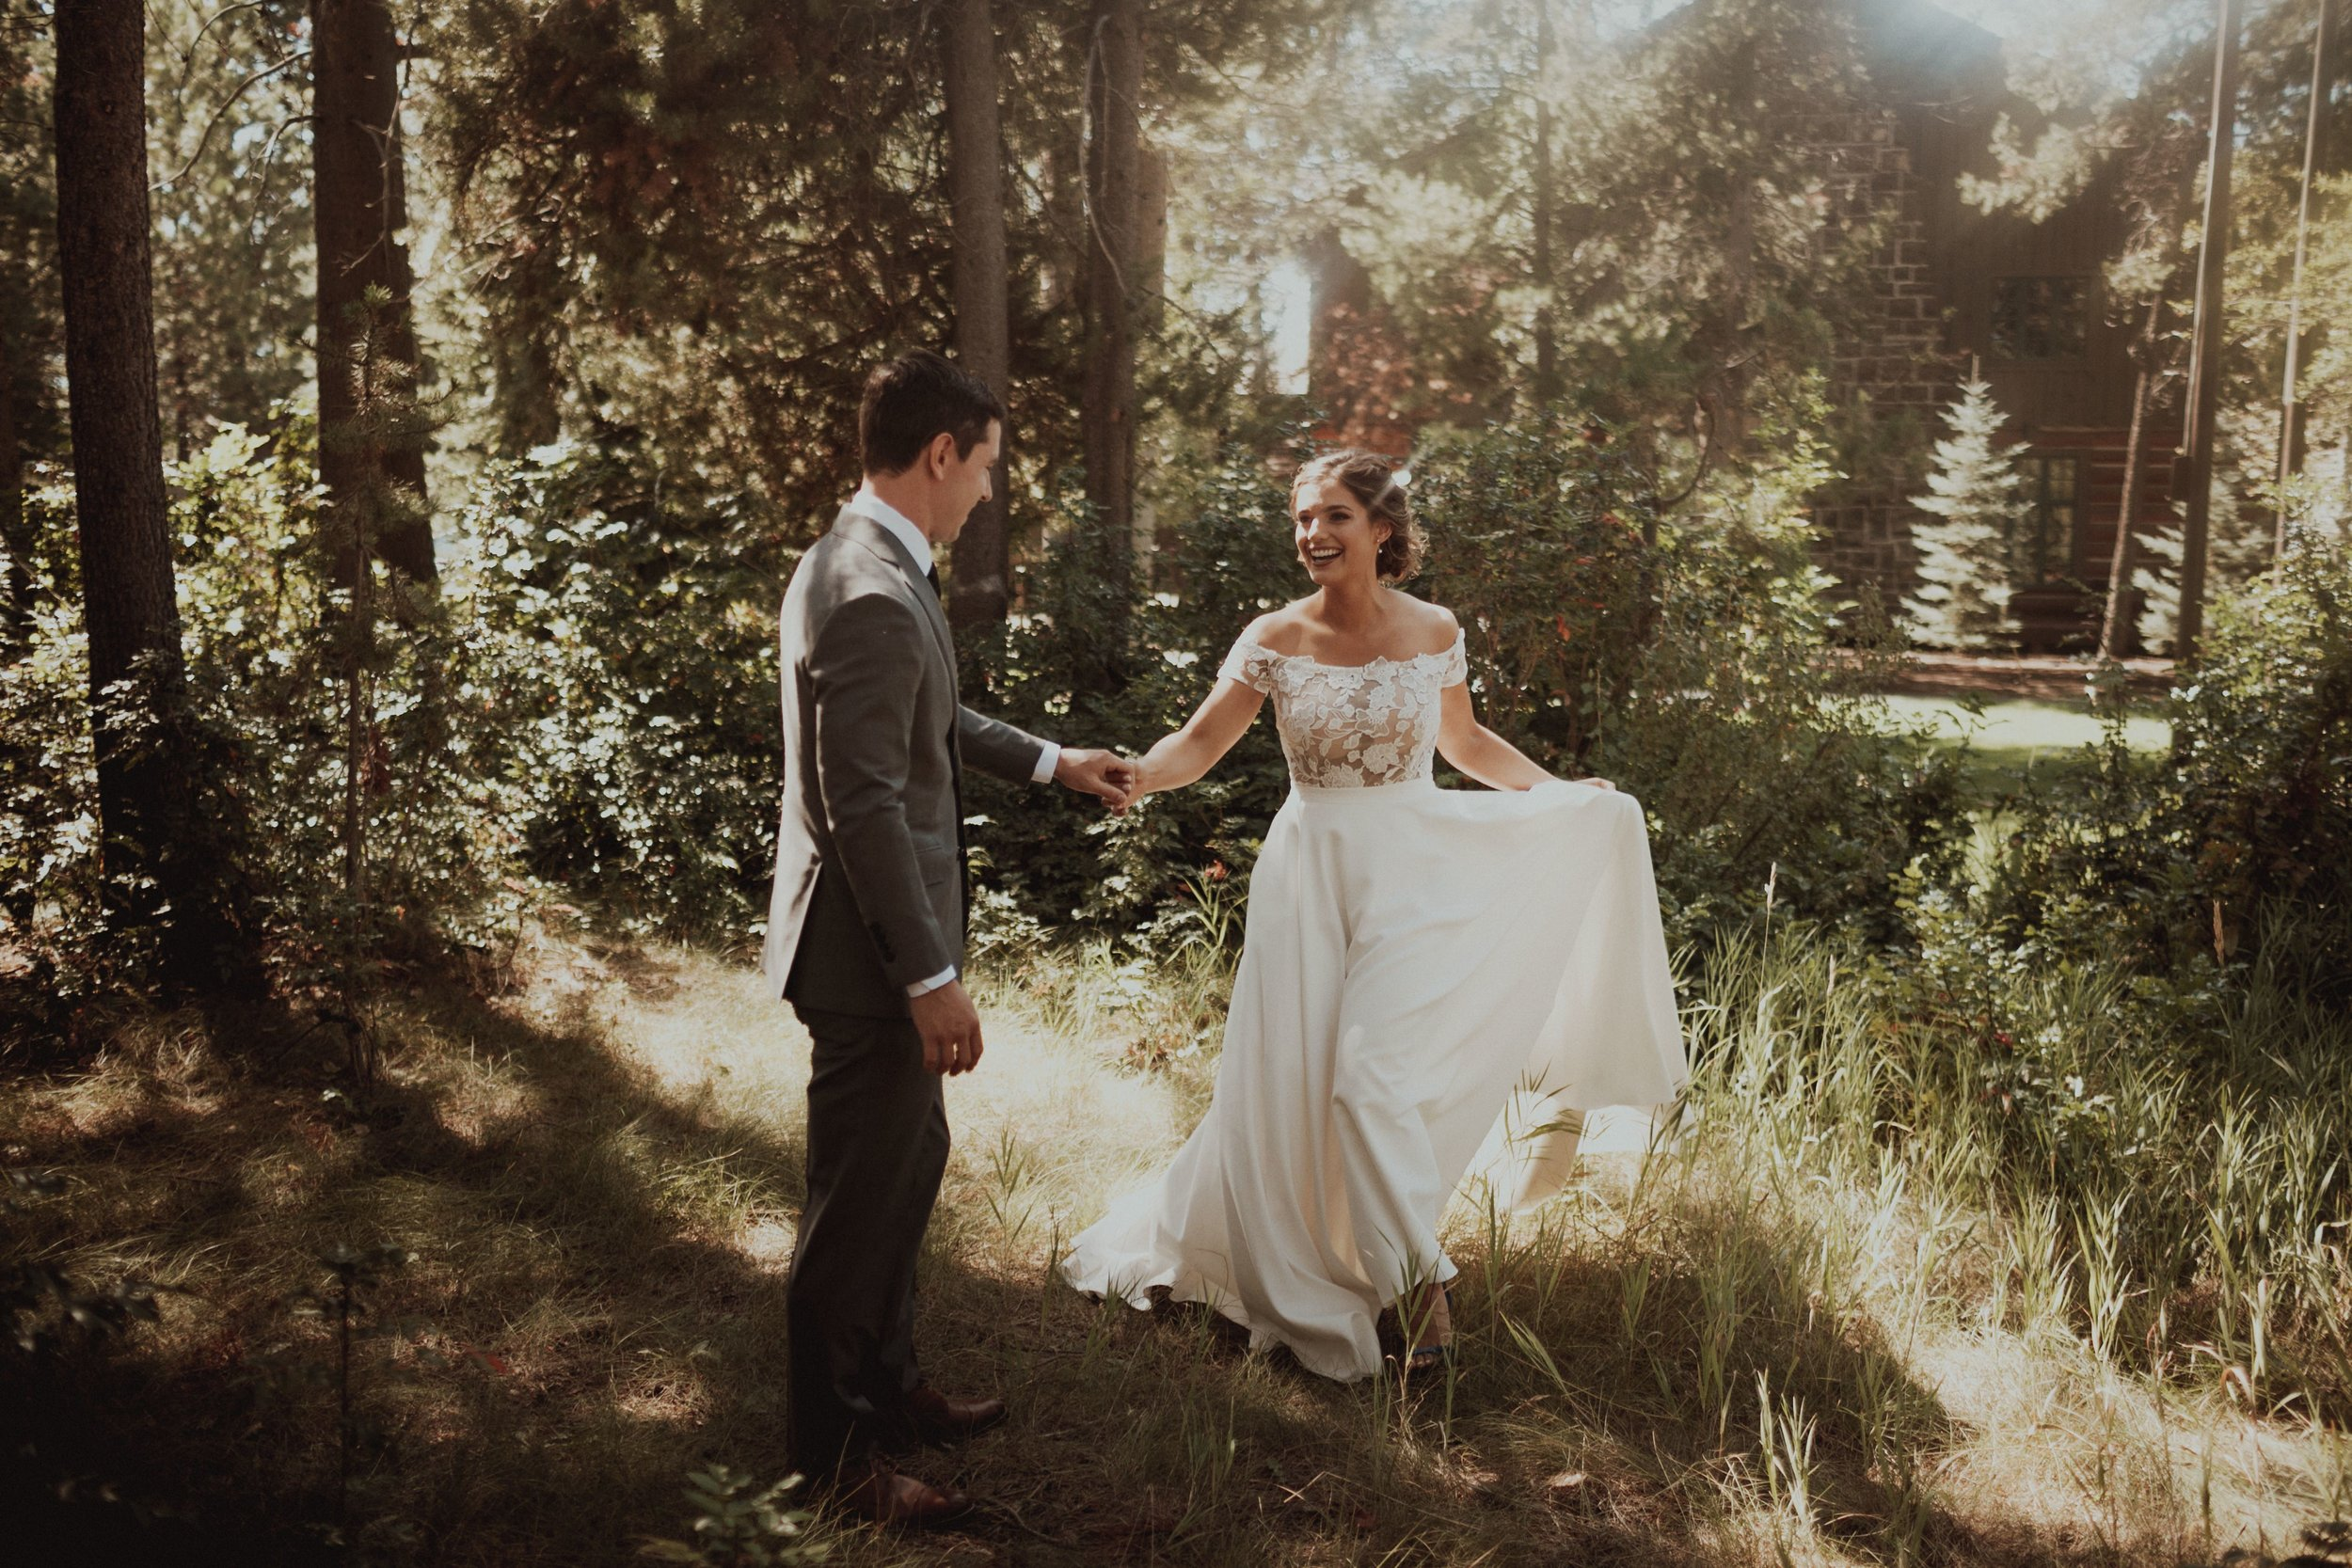 J and M Wed in Sunriver.Lauren Apel Photo173.jpg